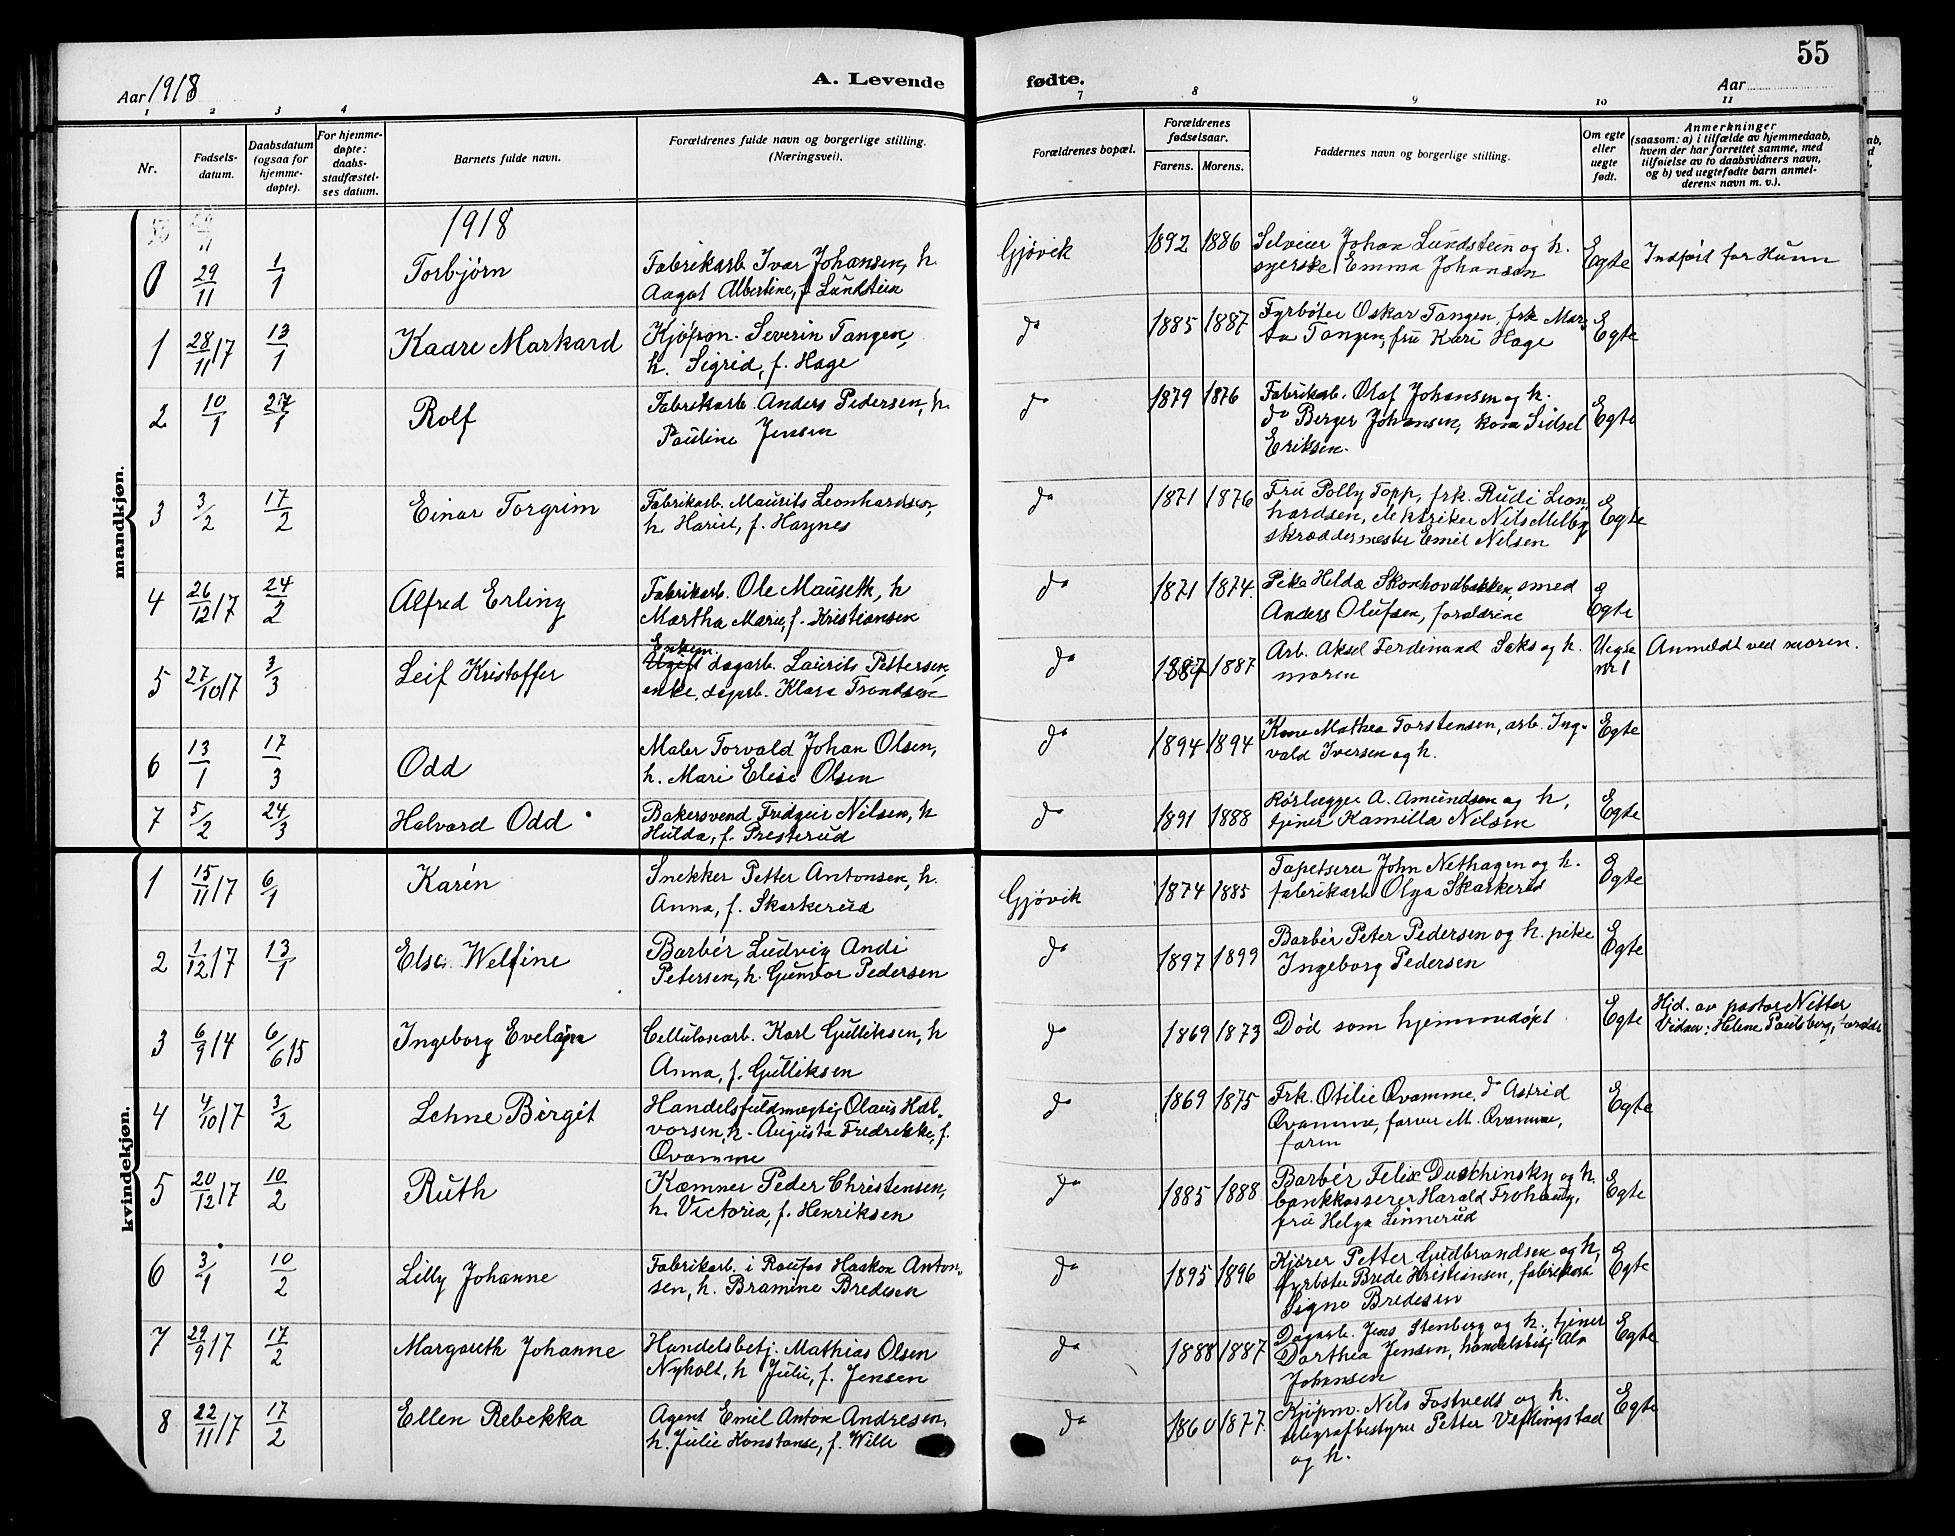 SAH, Vardal prestekontor, H/Ha/Hab/L0014: Klokkerbok nr. 14, 1911-1922, s. 55